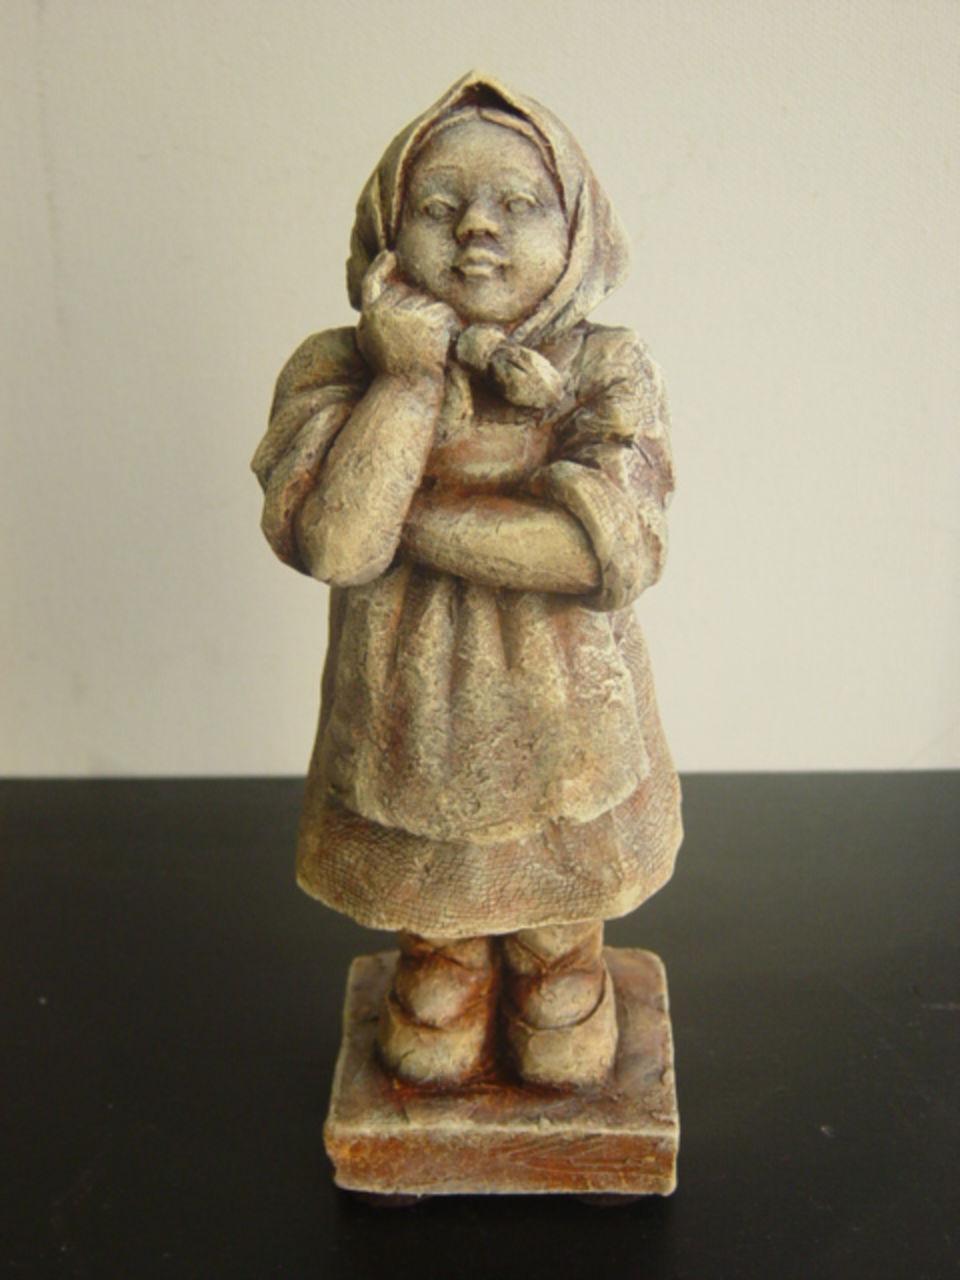 Nellka (Nelya Kantserova) Petite paysanne russe